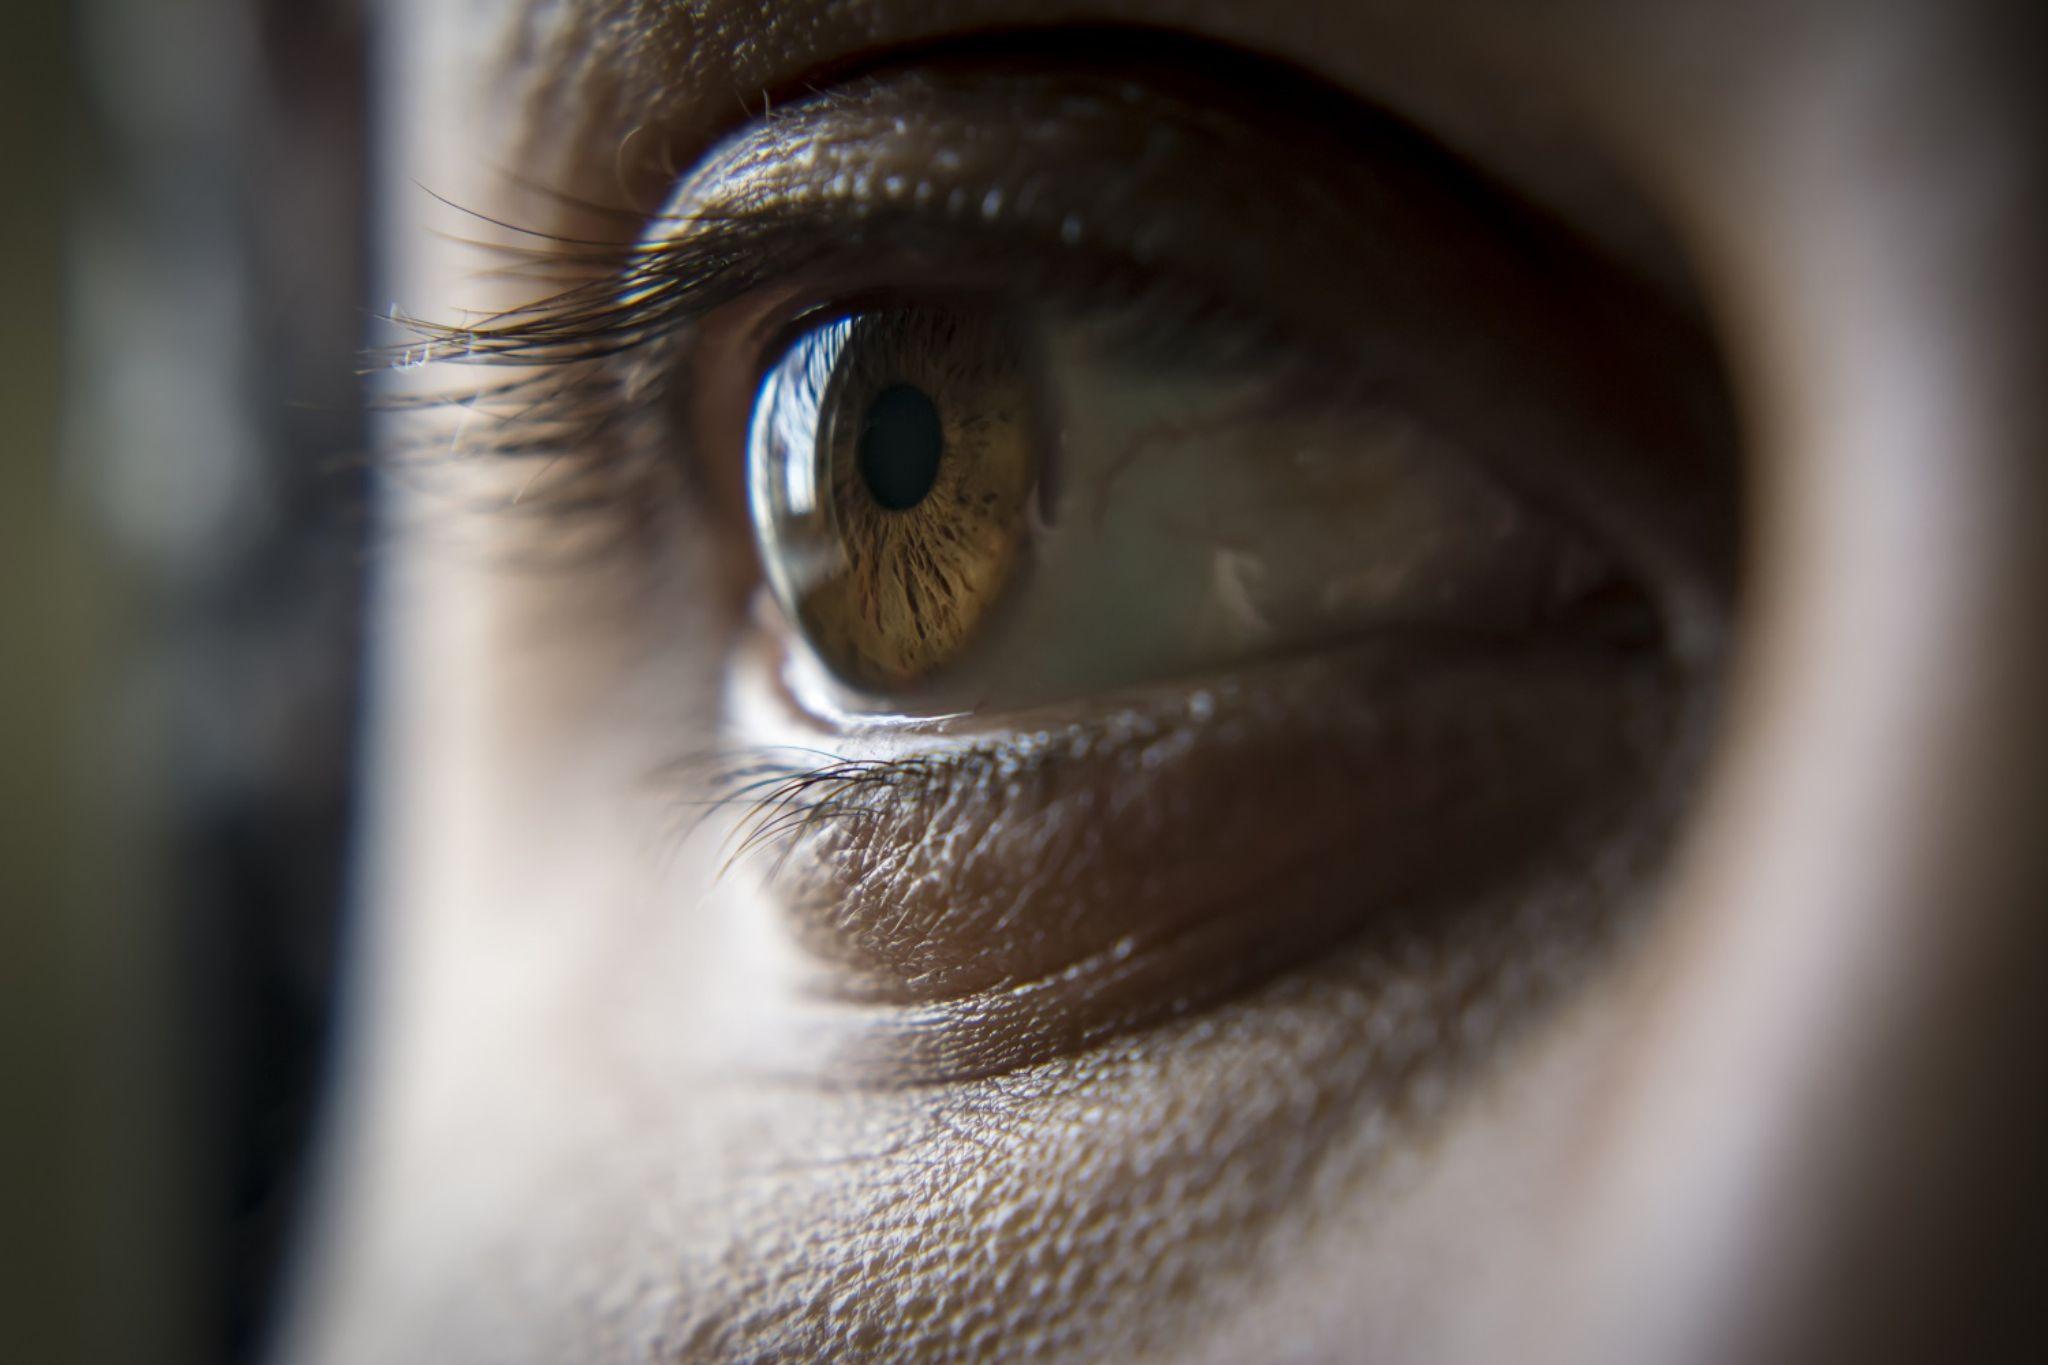 My eye by Reza Shahbazi